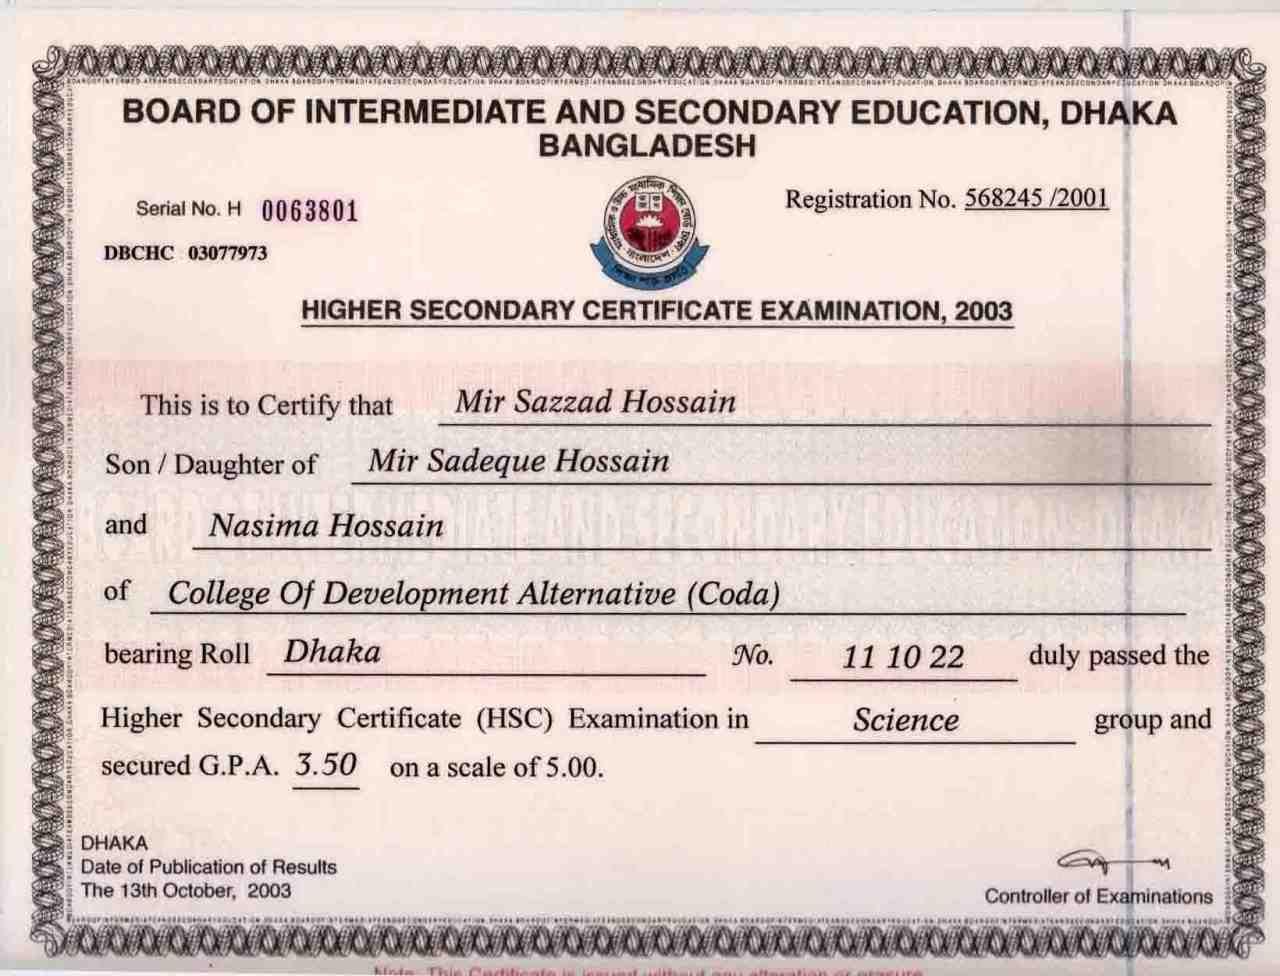 HSC Blank Certificate এর ছবির ফলাফল Blank certificate